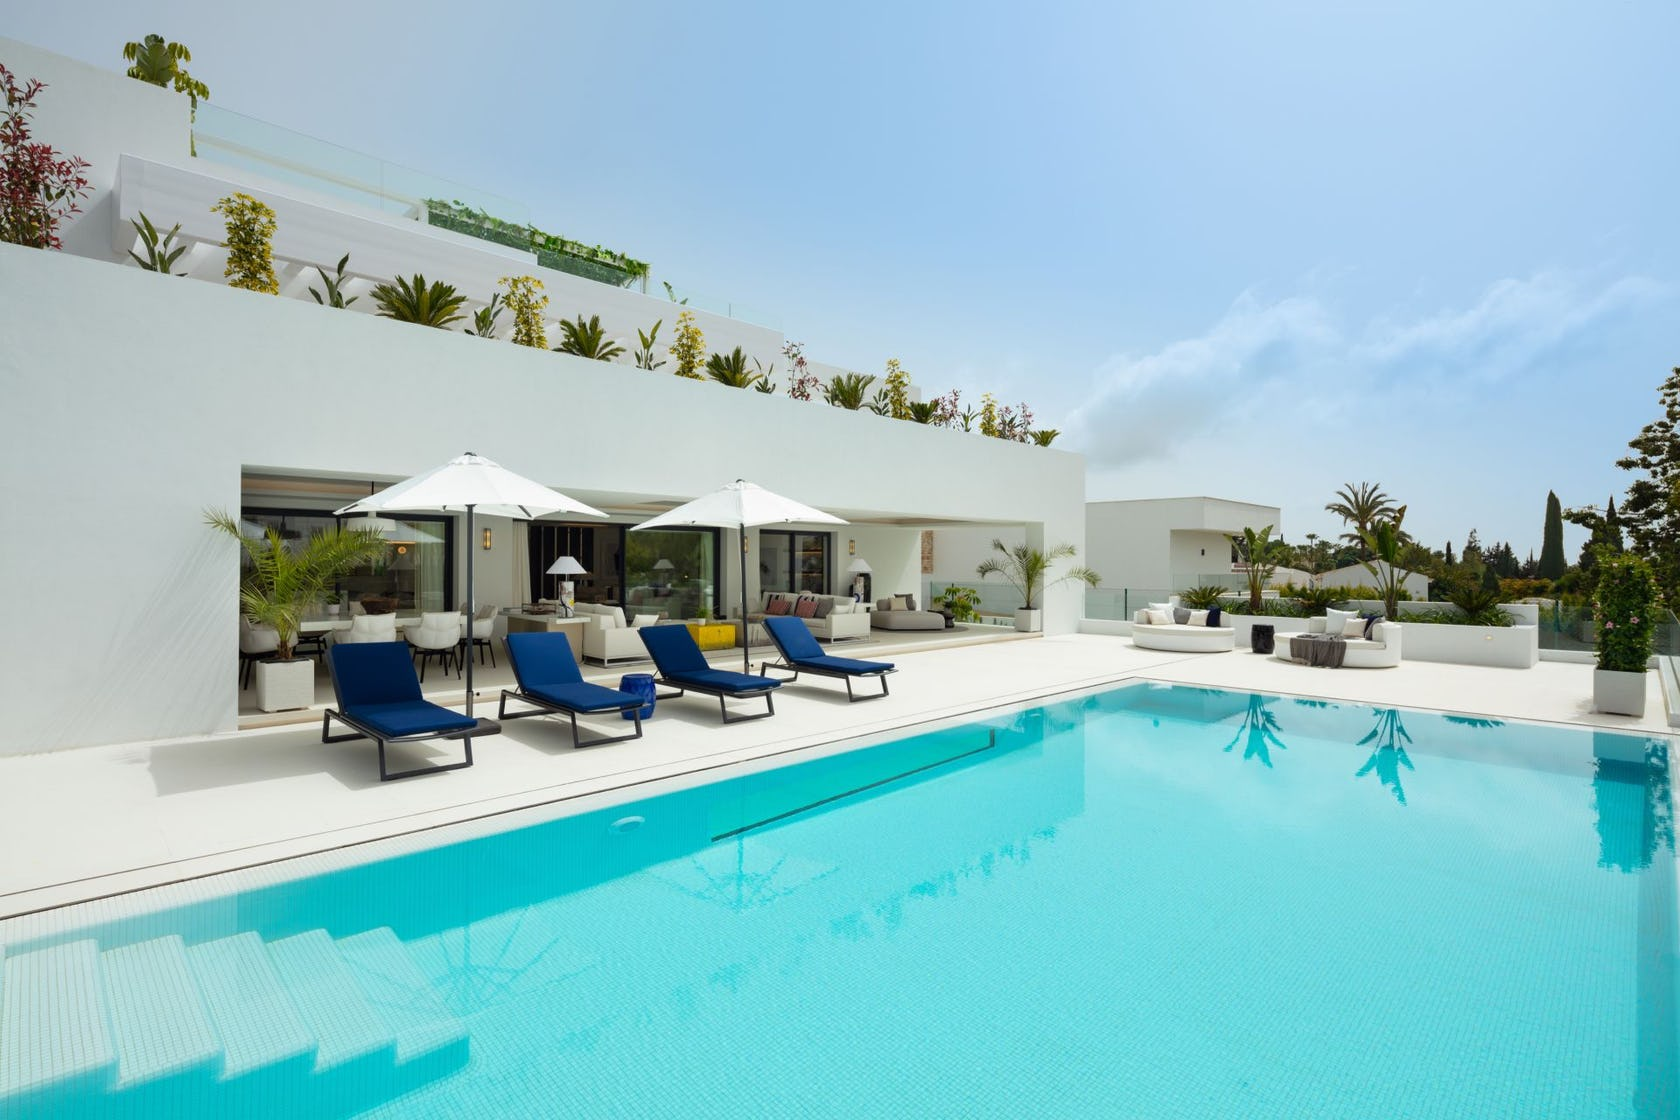 pool water swimming pool building hotel